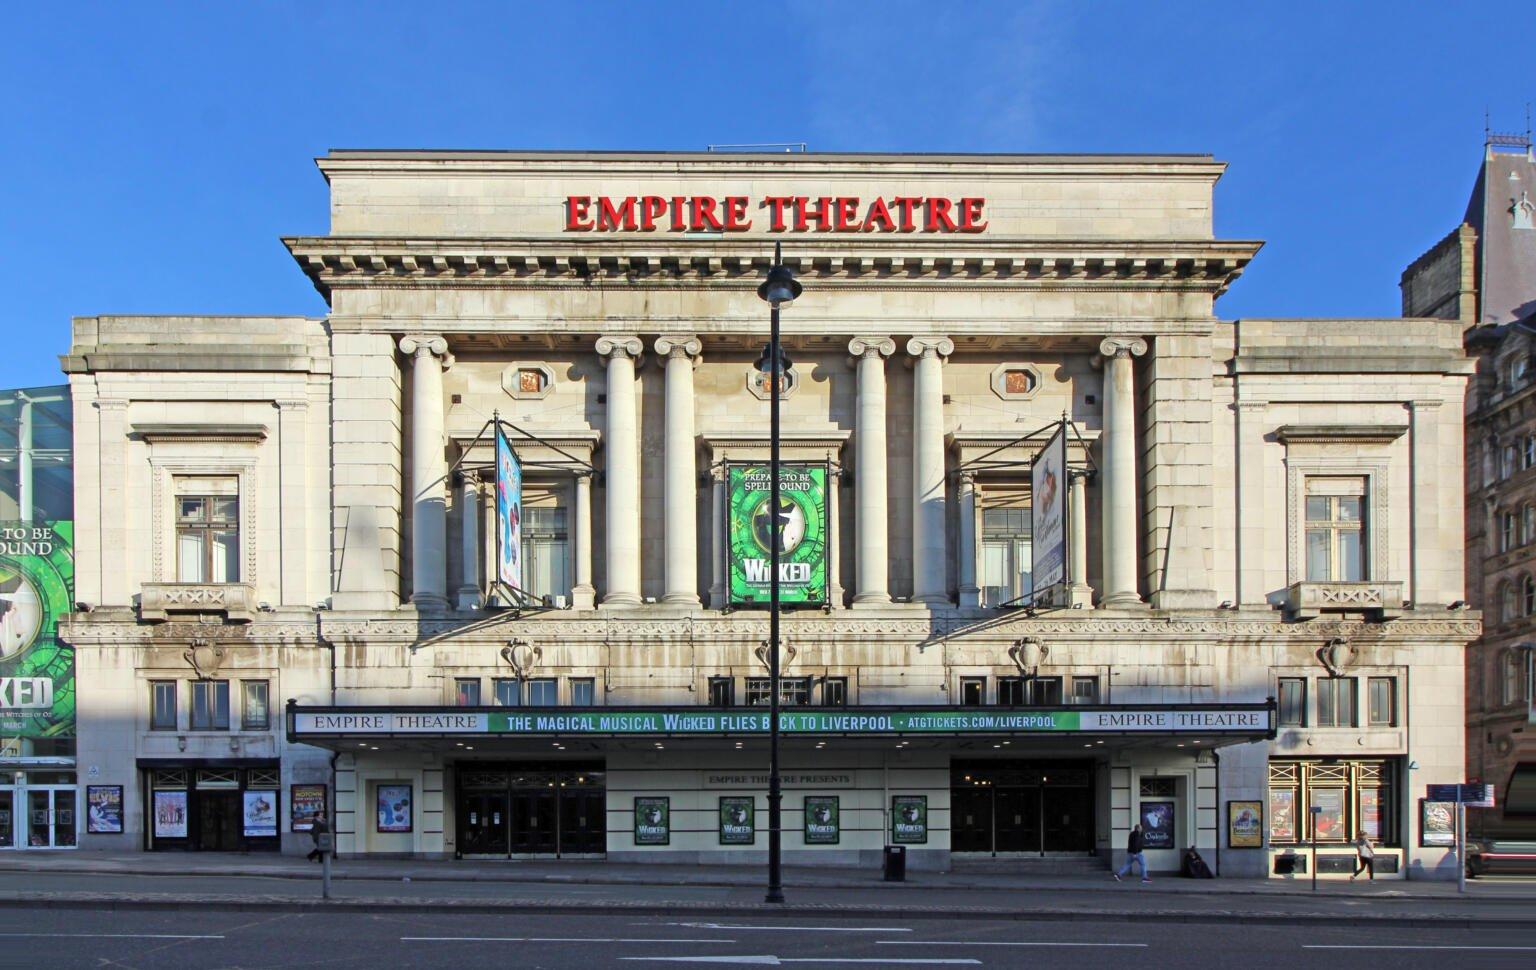 Liverpool entertainment